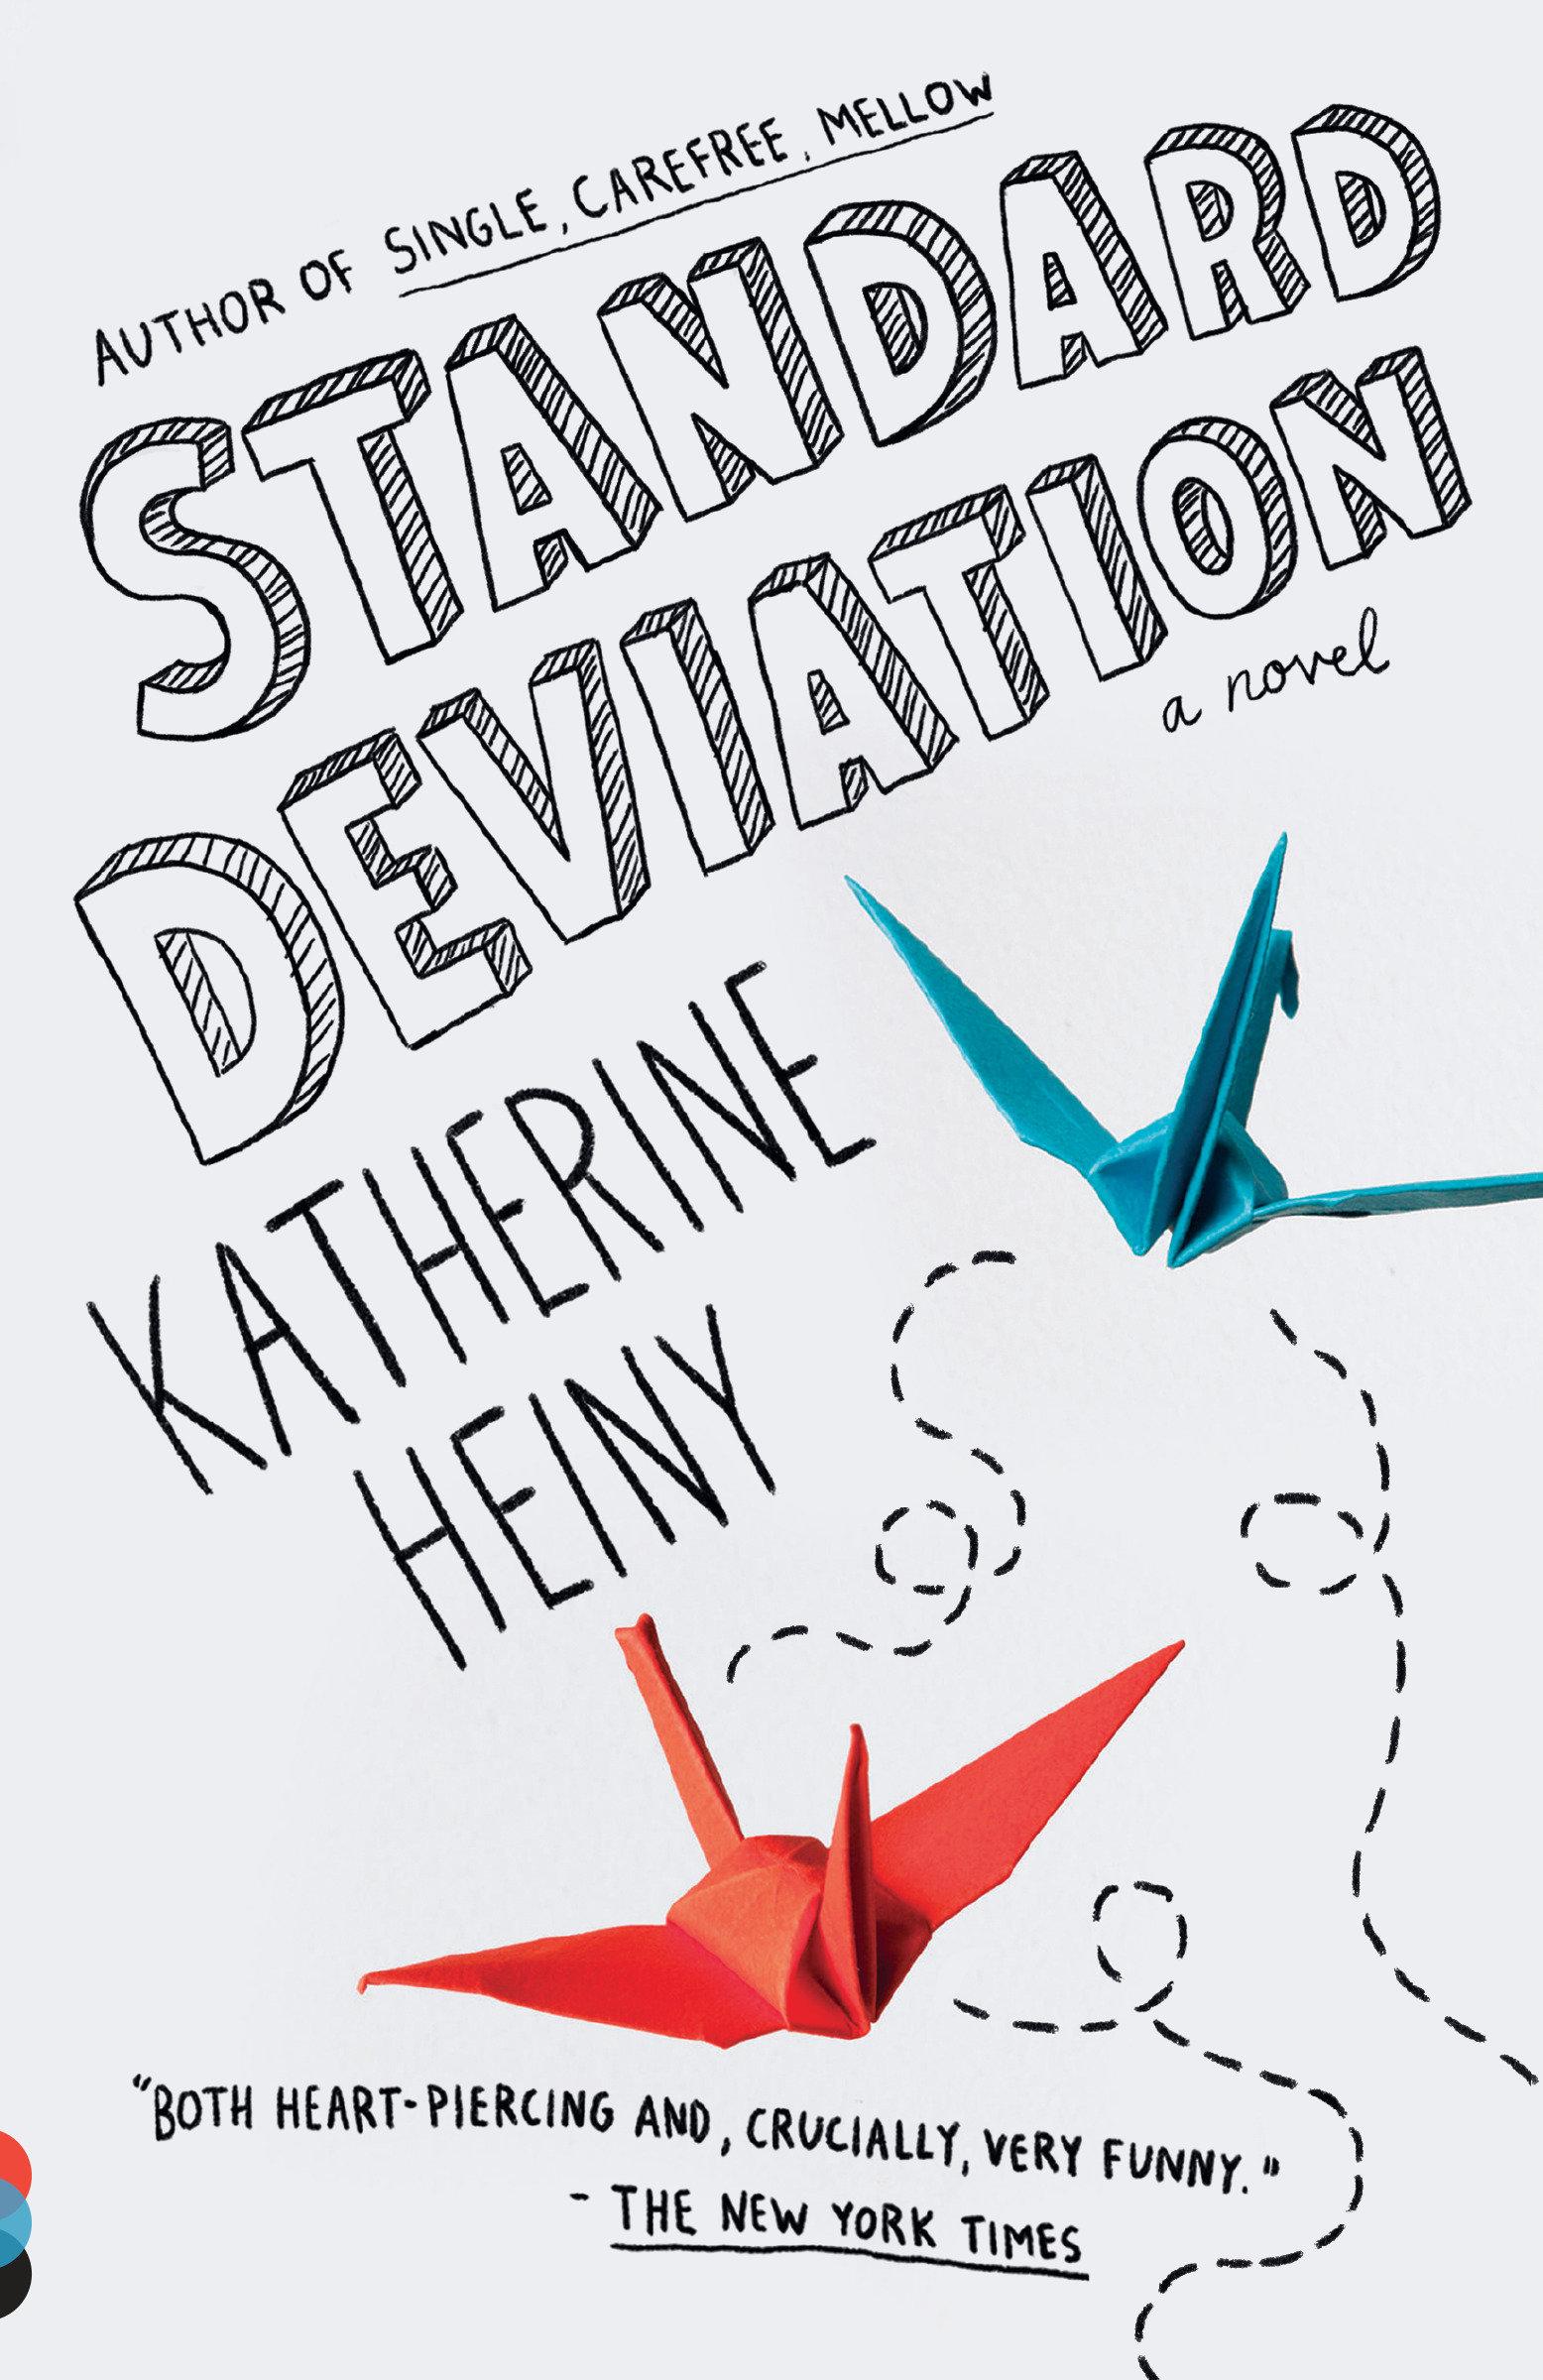 Standard Deviation A novel